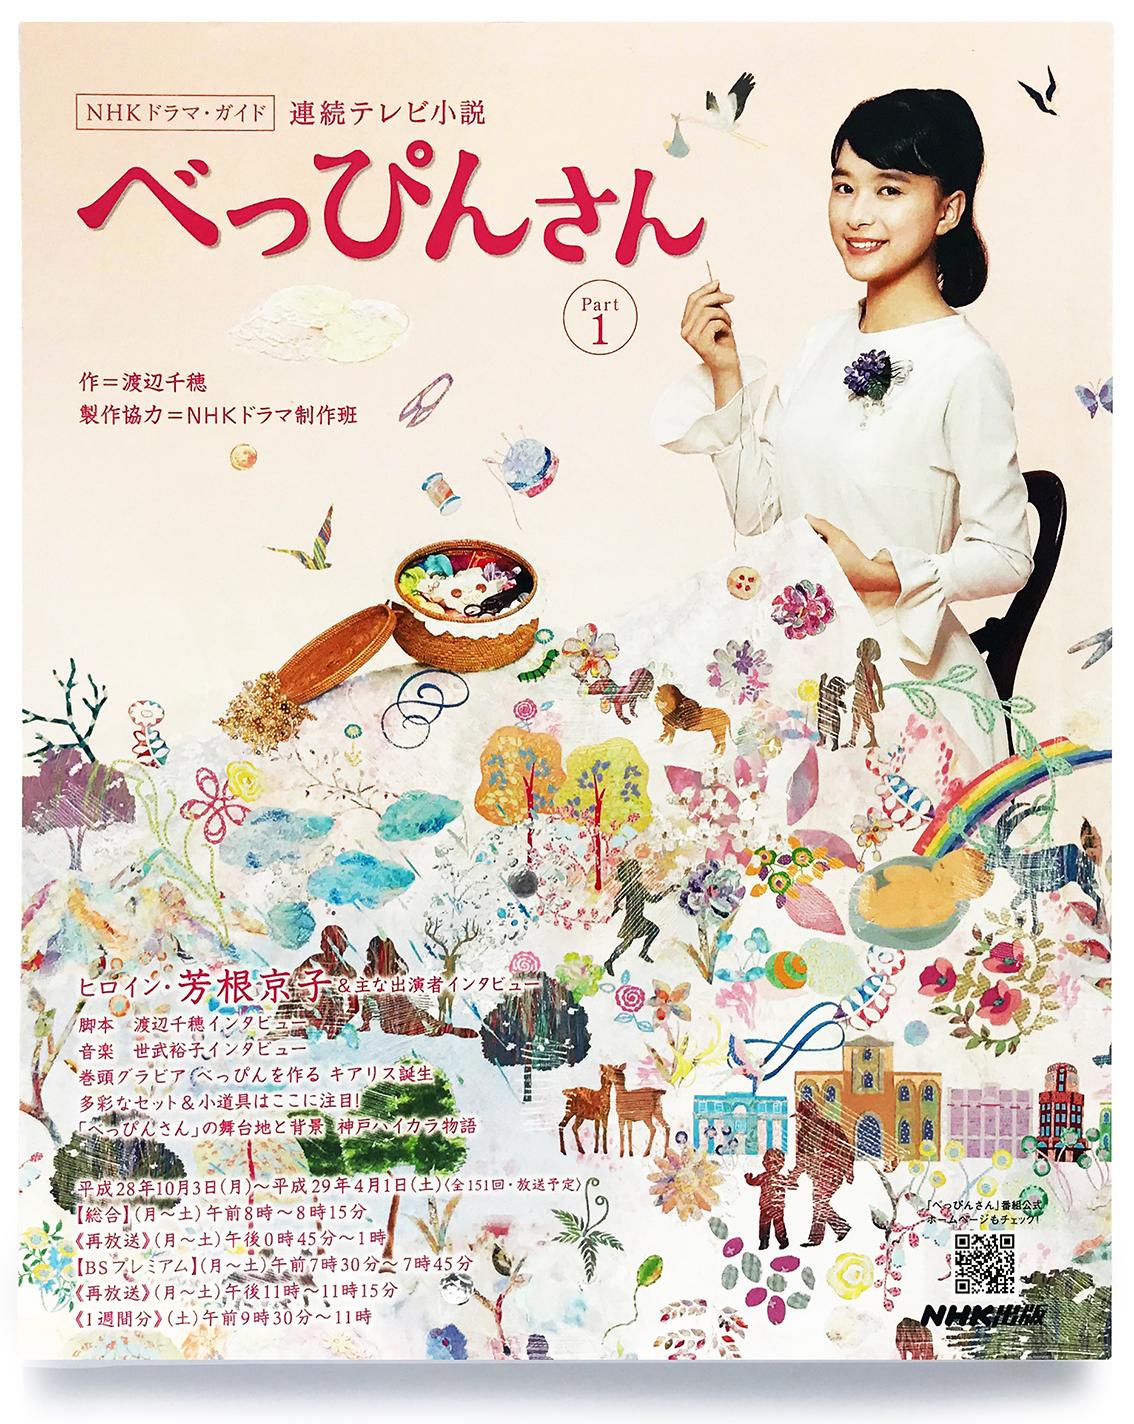 NHKドラマ・ガイド『連続テレビ小説 べっぴんさん』